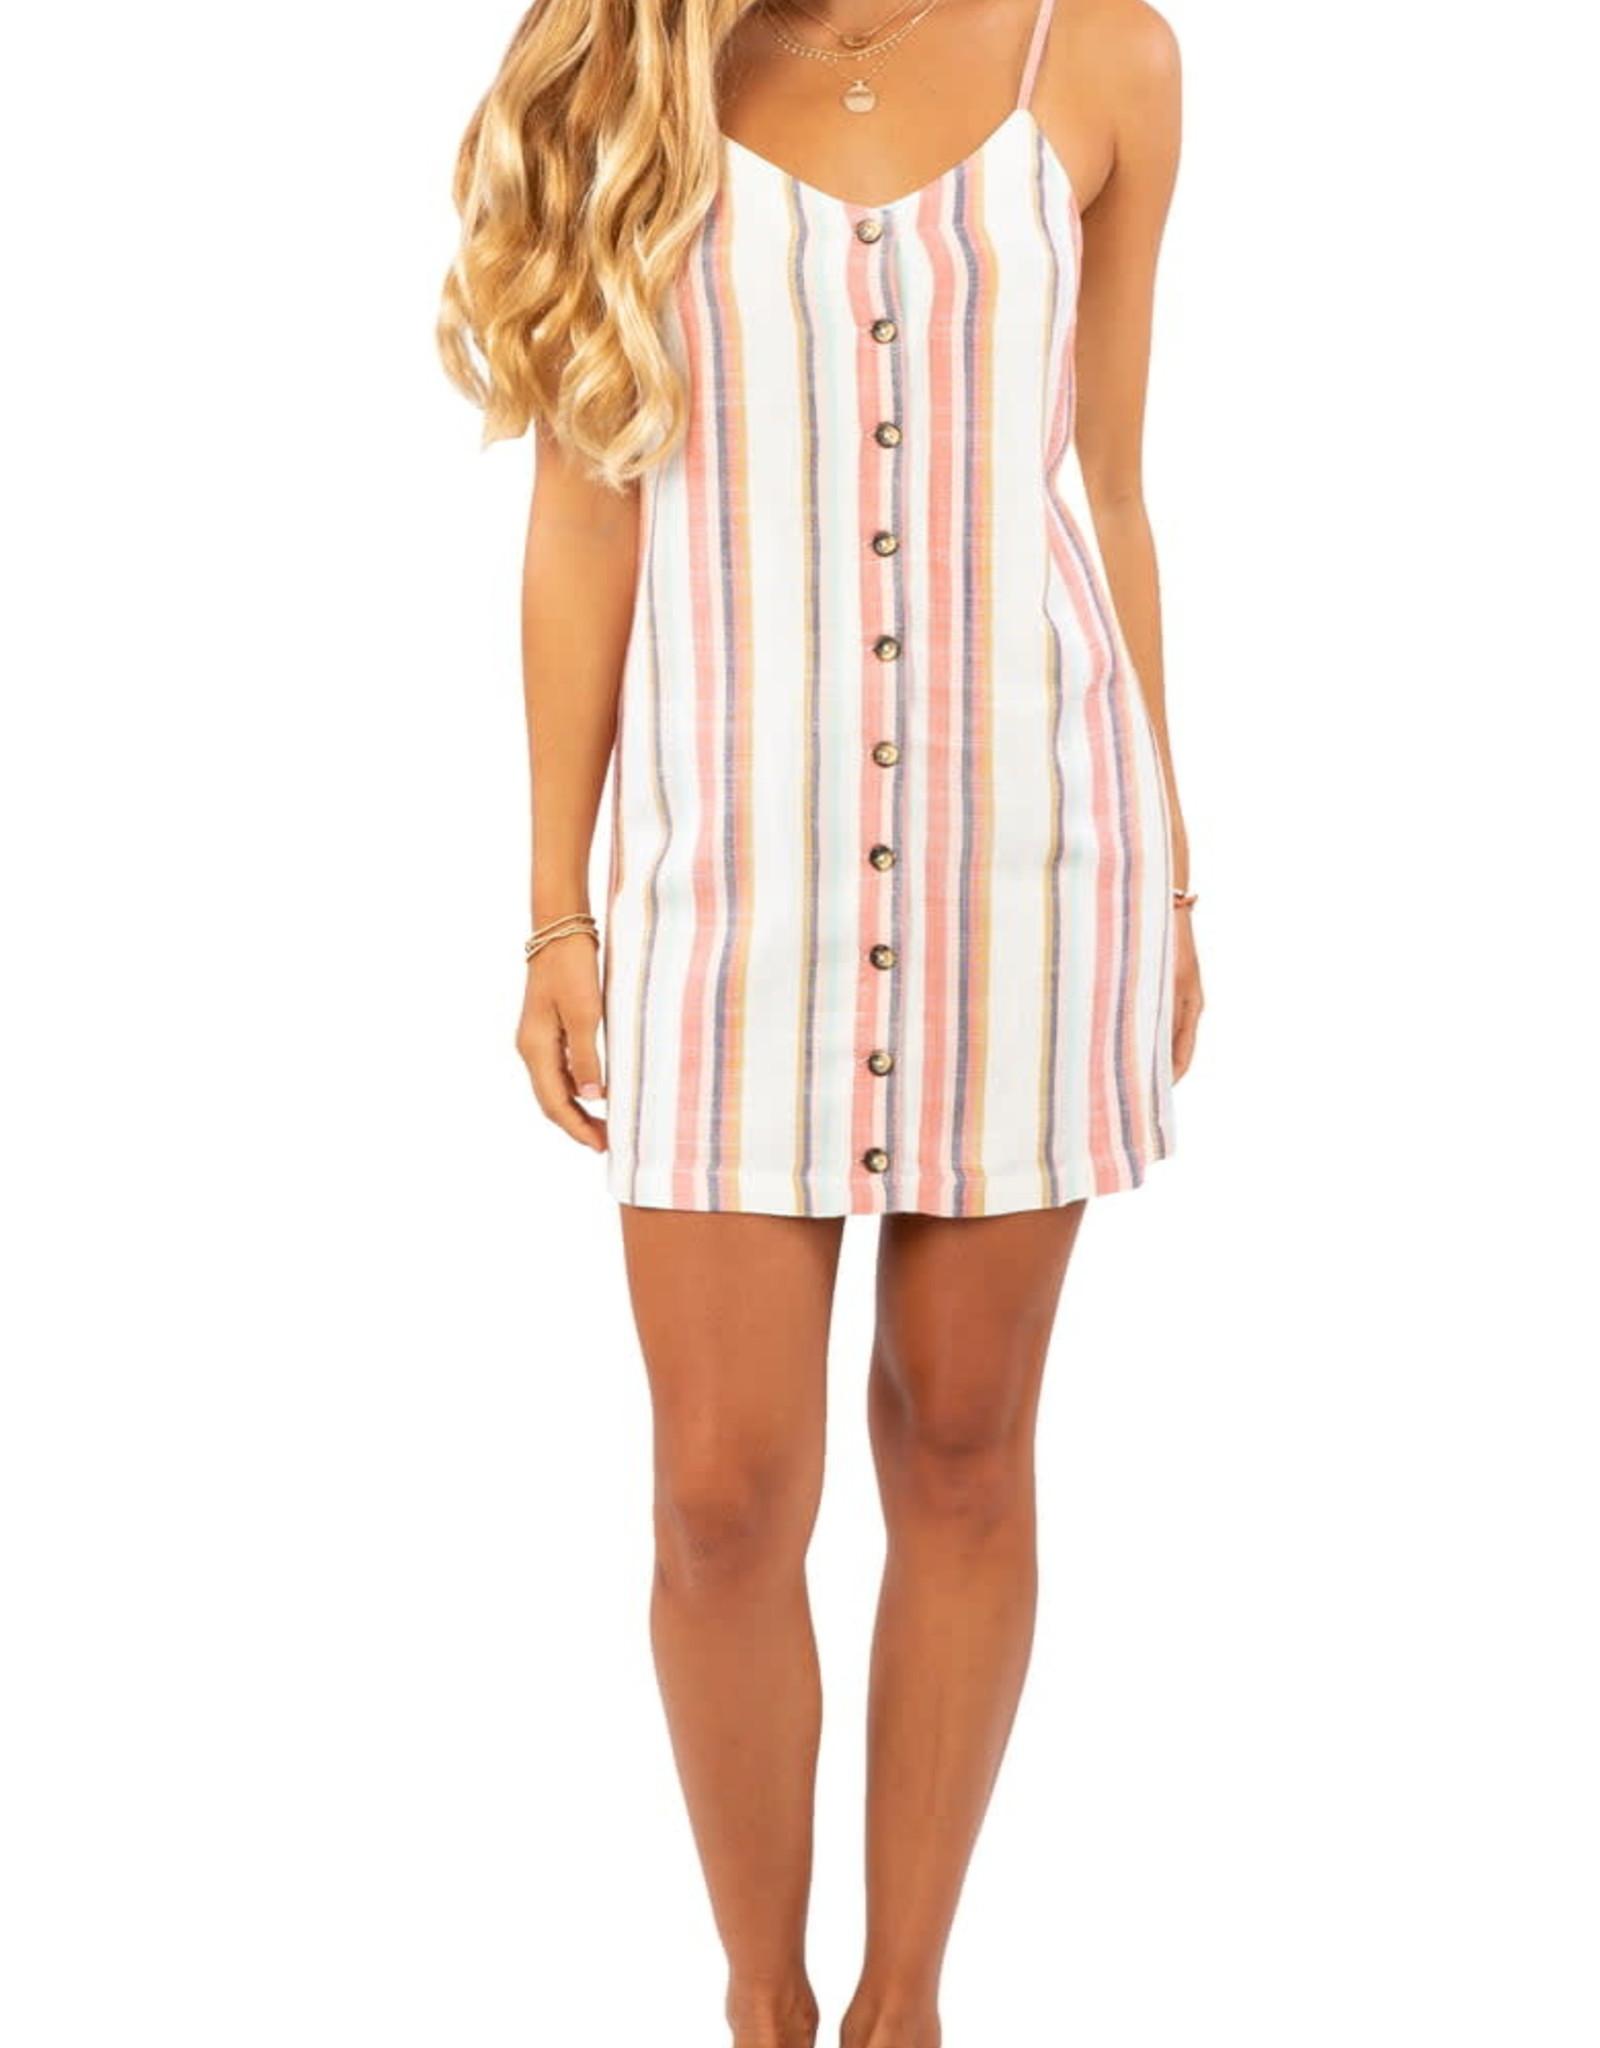 rip curl rip curl seaport stripe dress style gdriv8